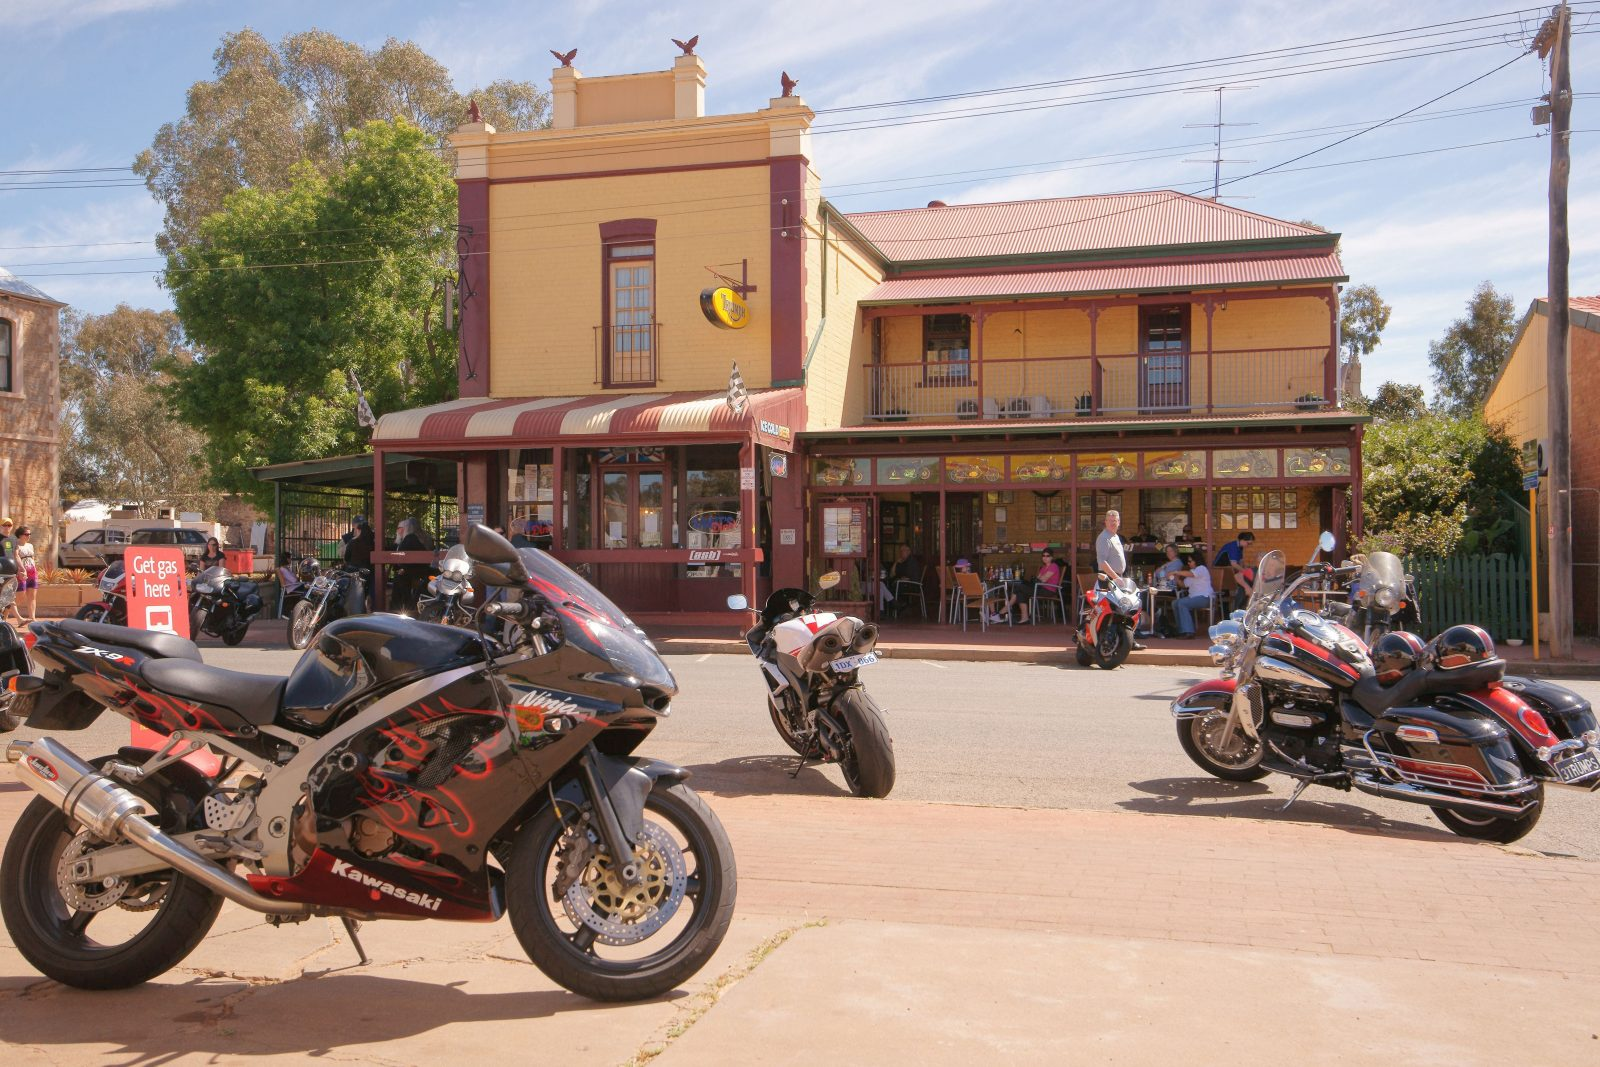 York Motorcycle Festival, York, Western Australia